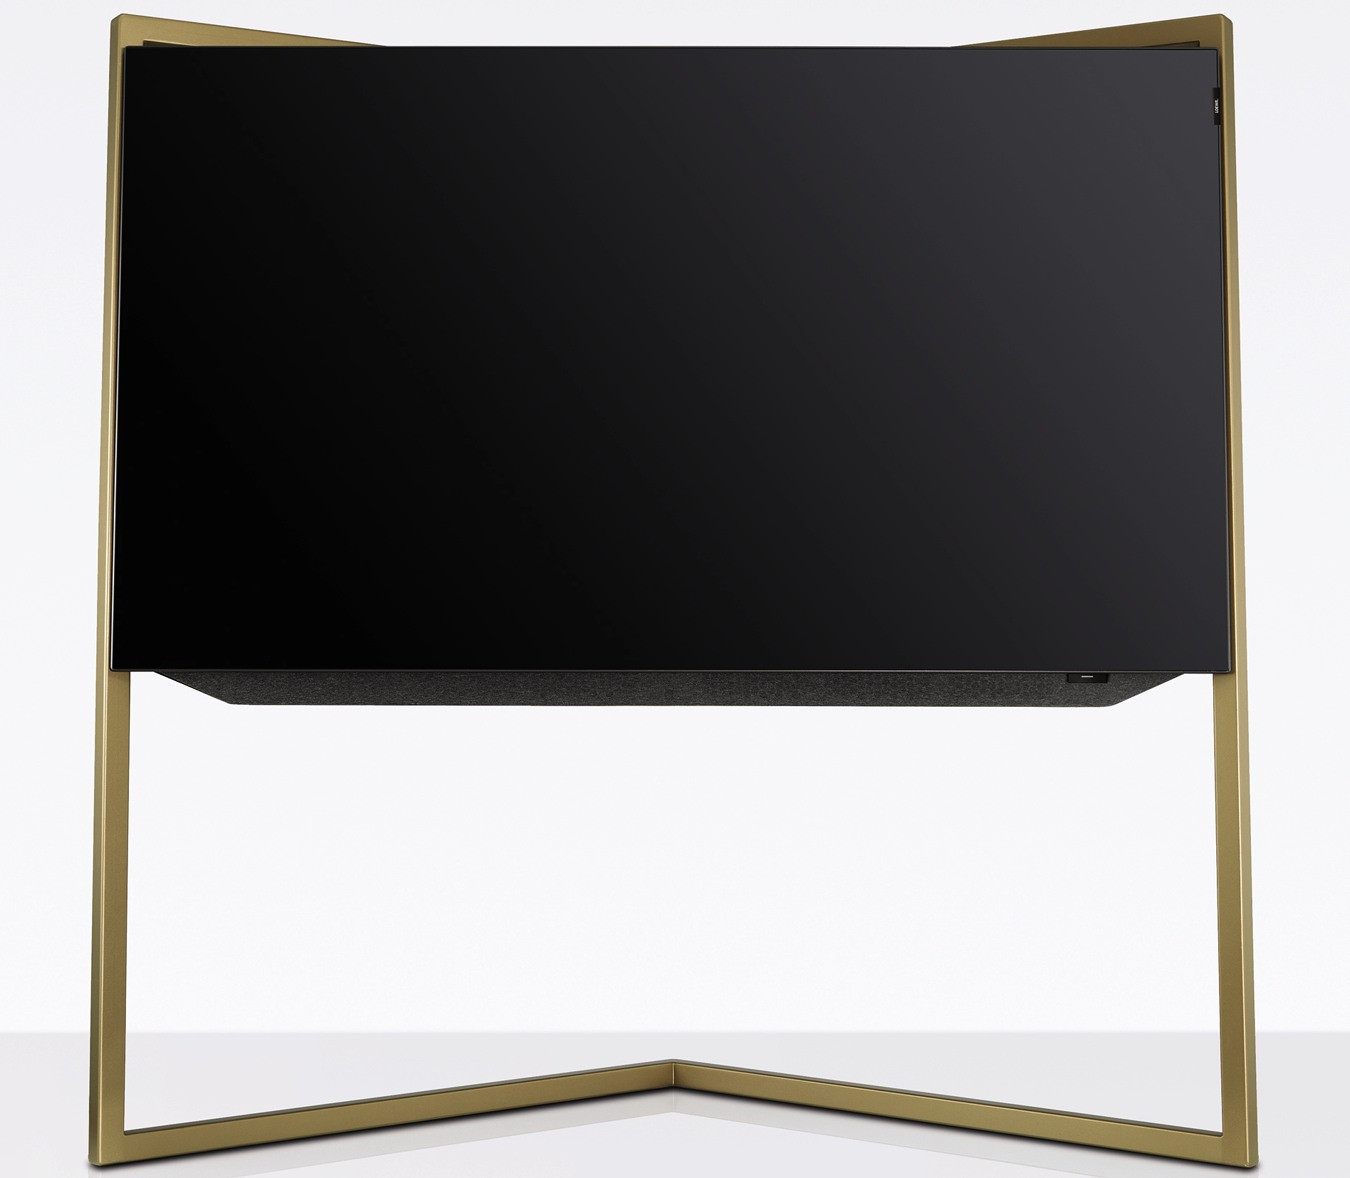 loewe bild mit floorstand amber gold fernseher. Black Bedroom Furniture Sets. Home Design Ideas